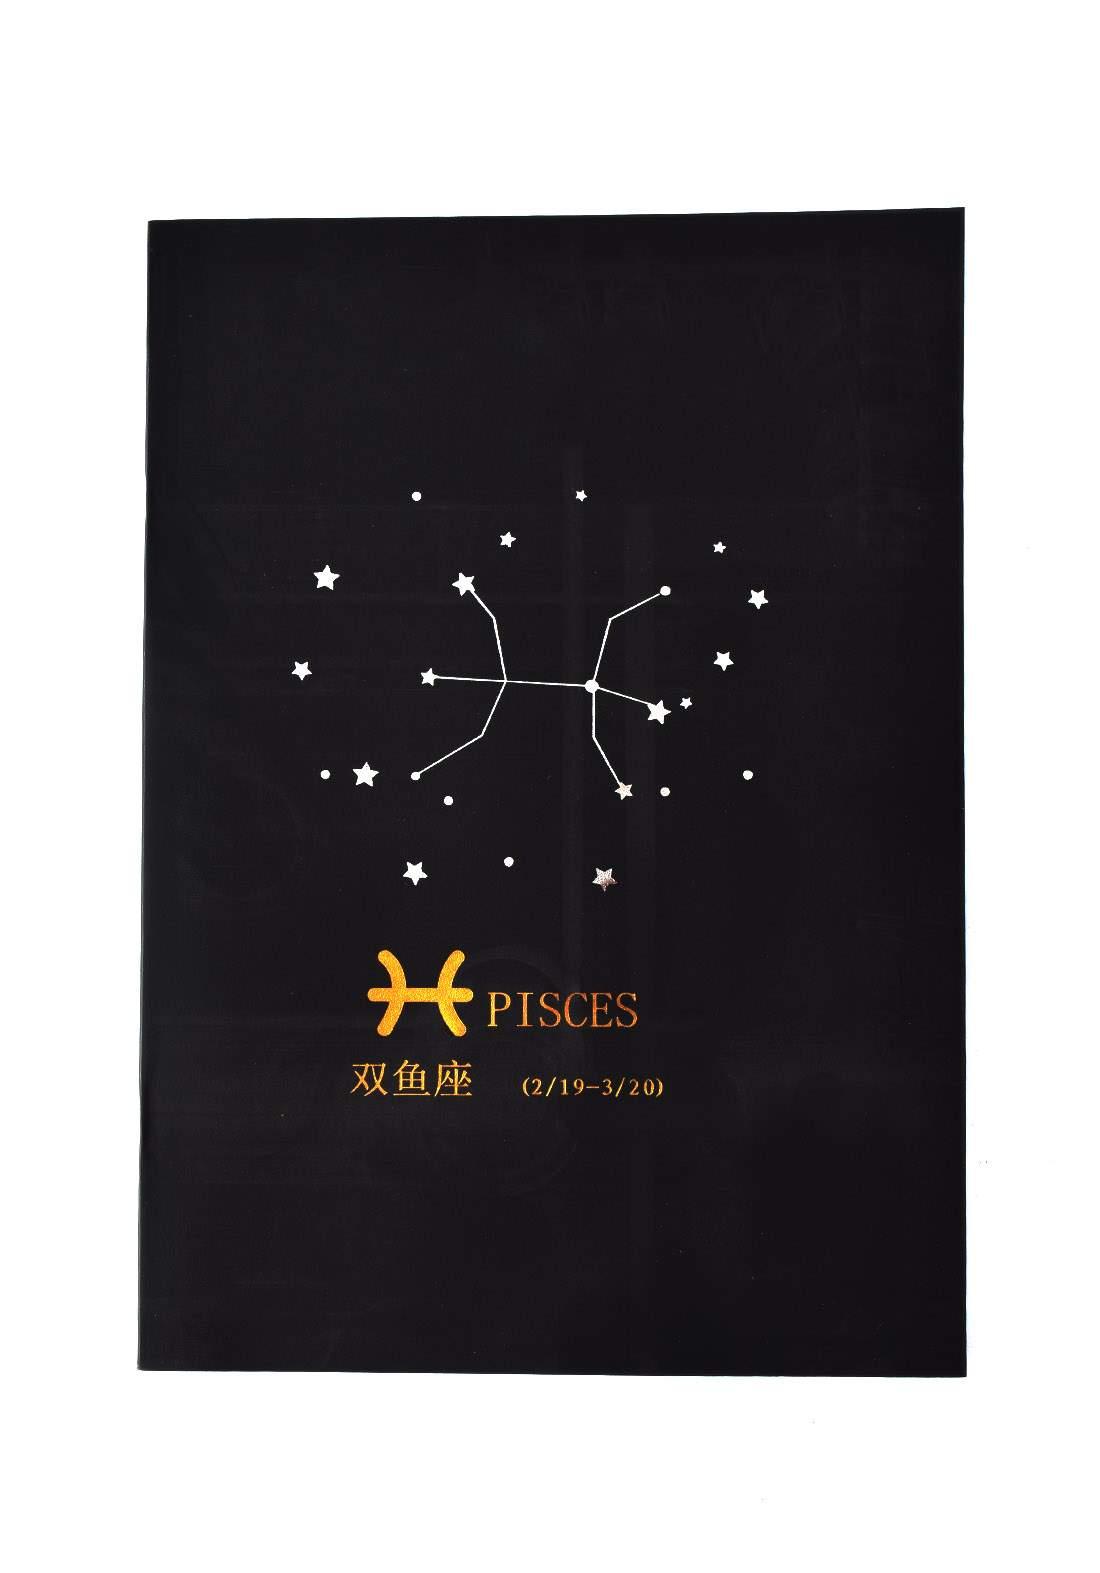 Big Black Drawing Book 24 Sheets-Pisces دفتر رسم اسود كبير بطبعة برج الحوت